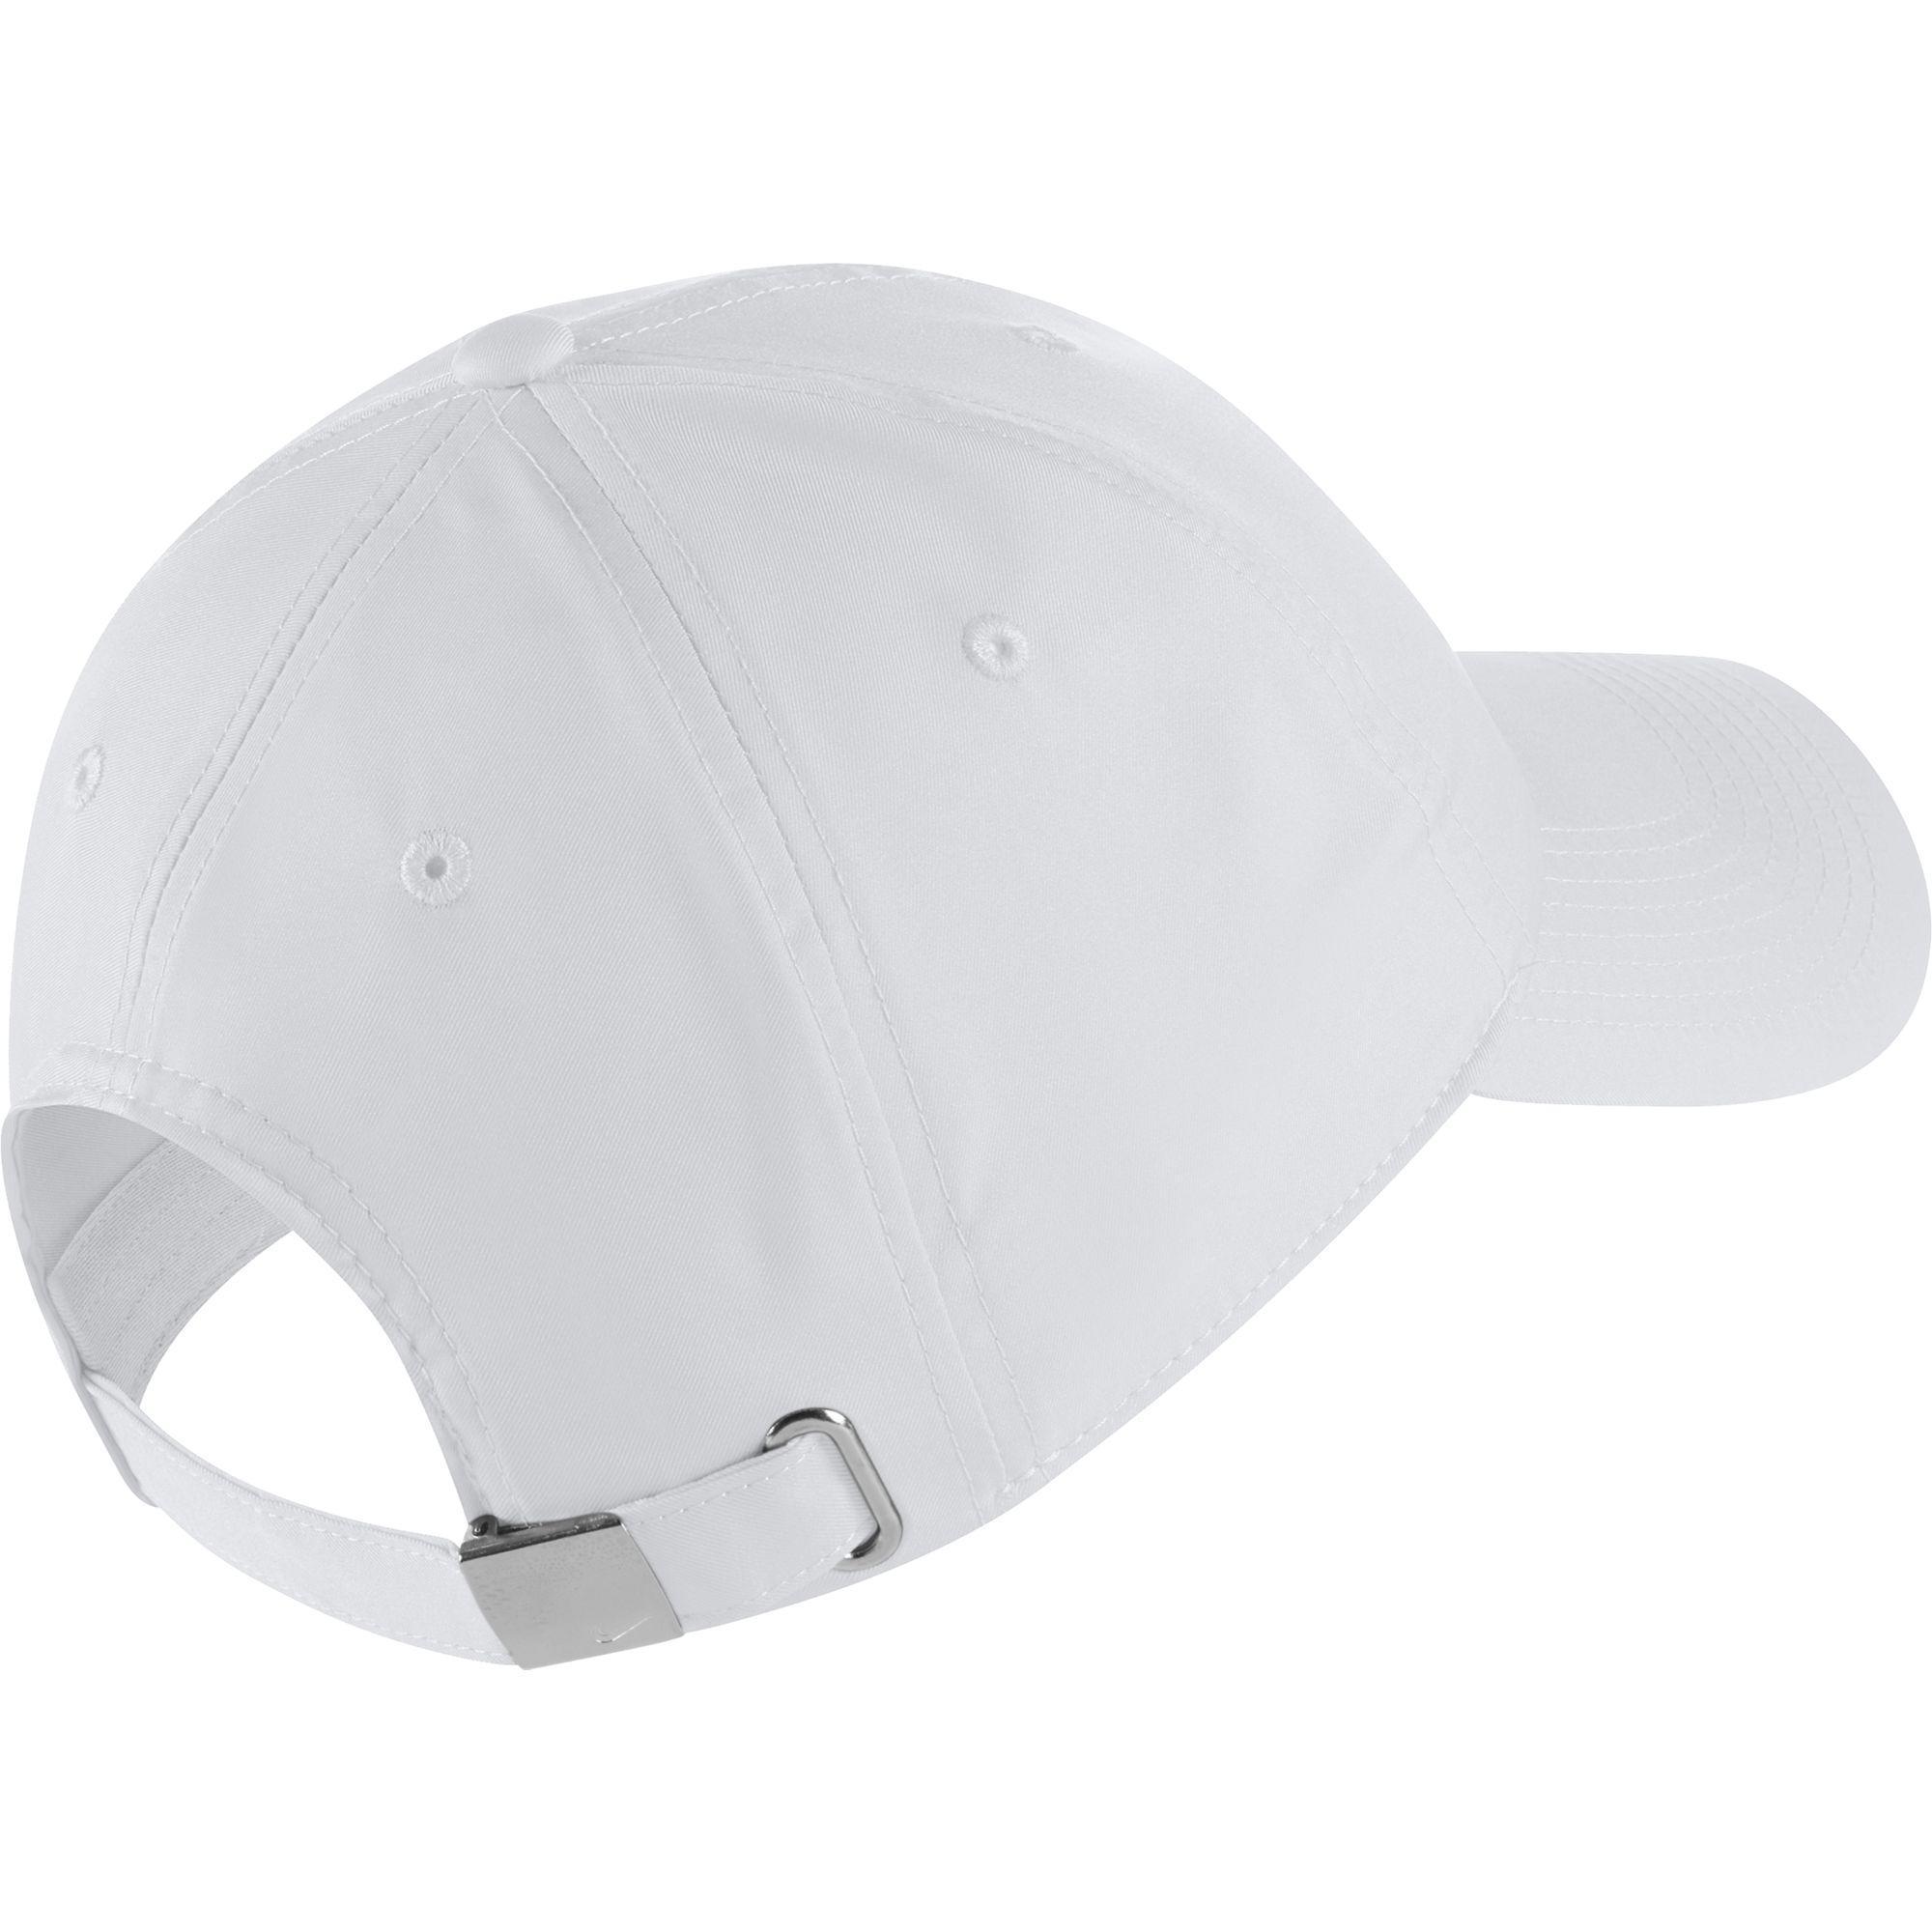 e33f88ca Nike Metal Swoosh H86 Adjustable Cap - White - Tennisnuts.com